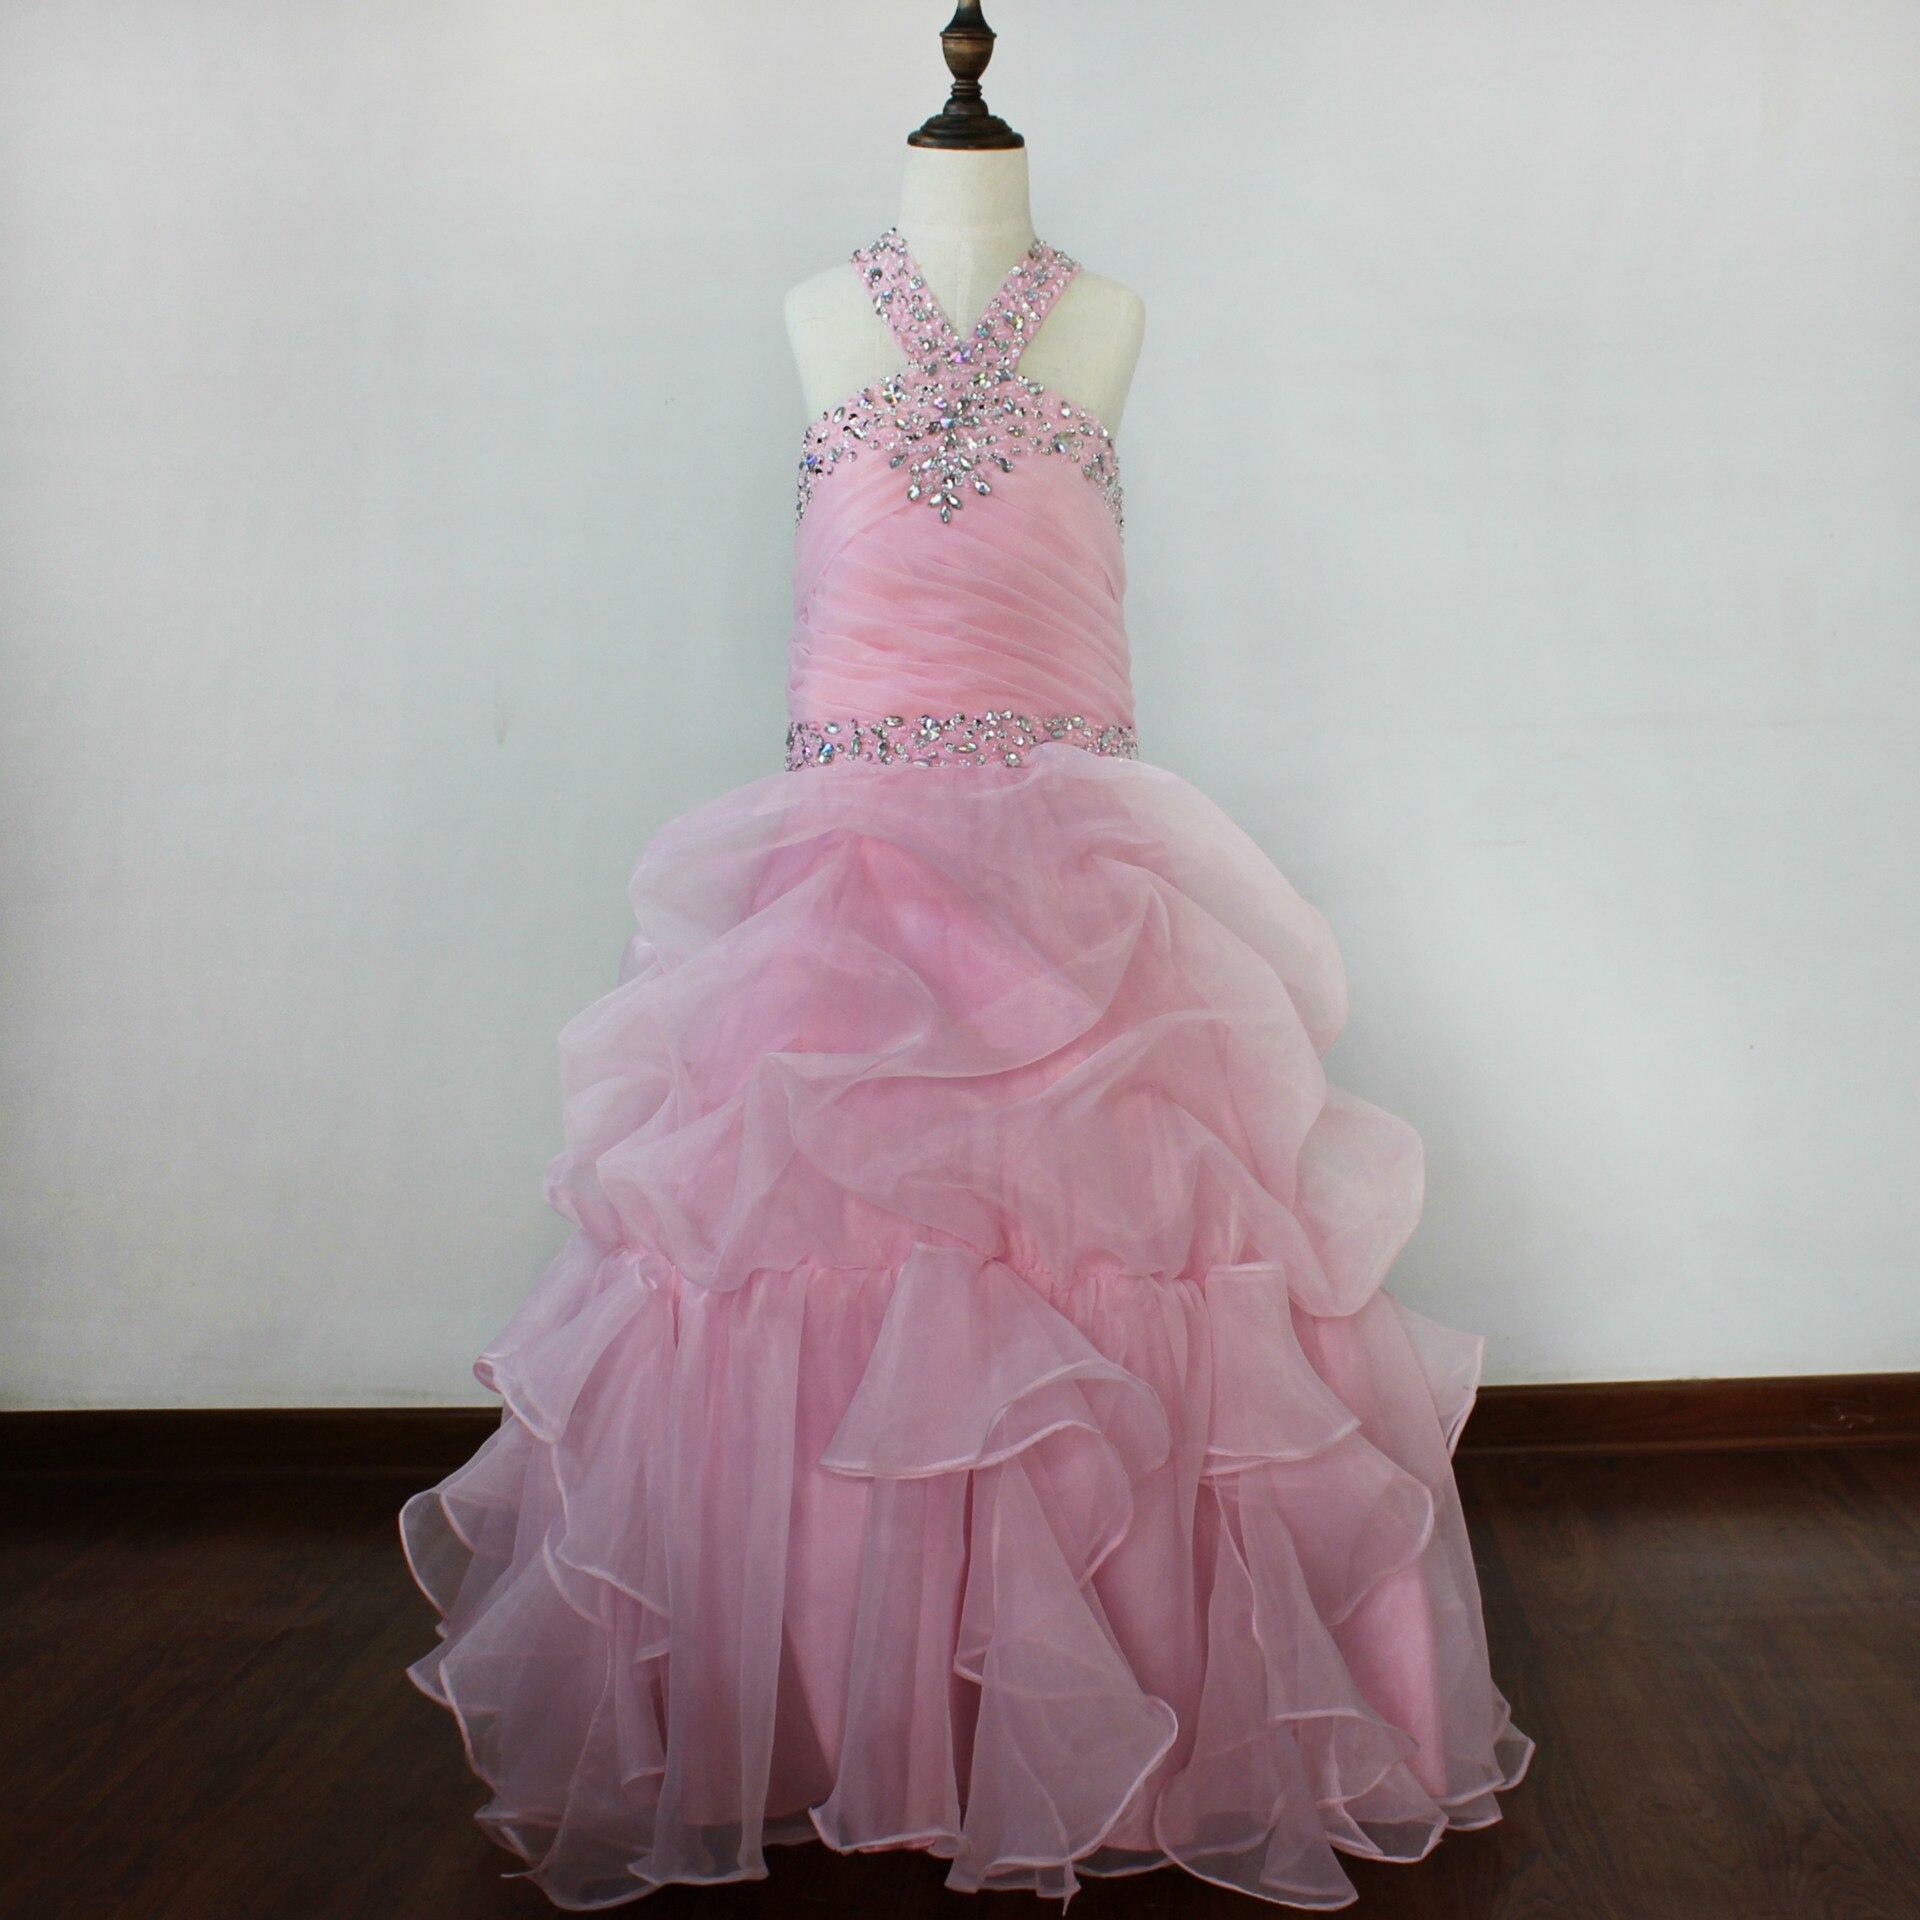 C025 European and American New Fashion children flower Dress wedding Party Princess Dress girl Ball gown Dress muqgew new fashion 2018 children party